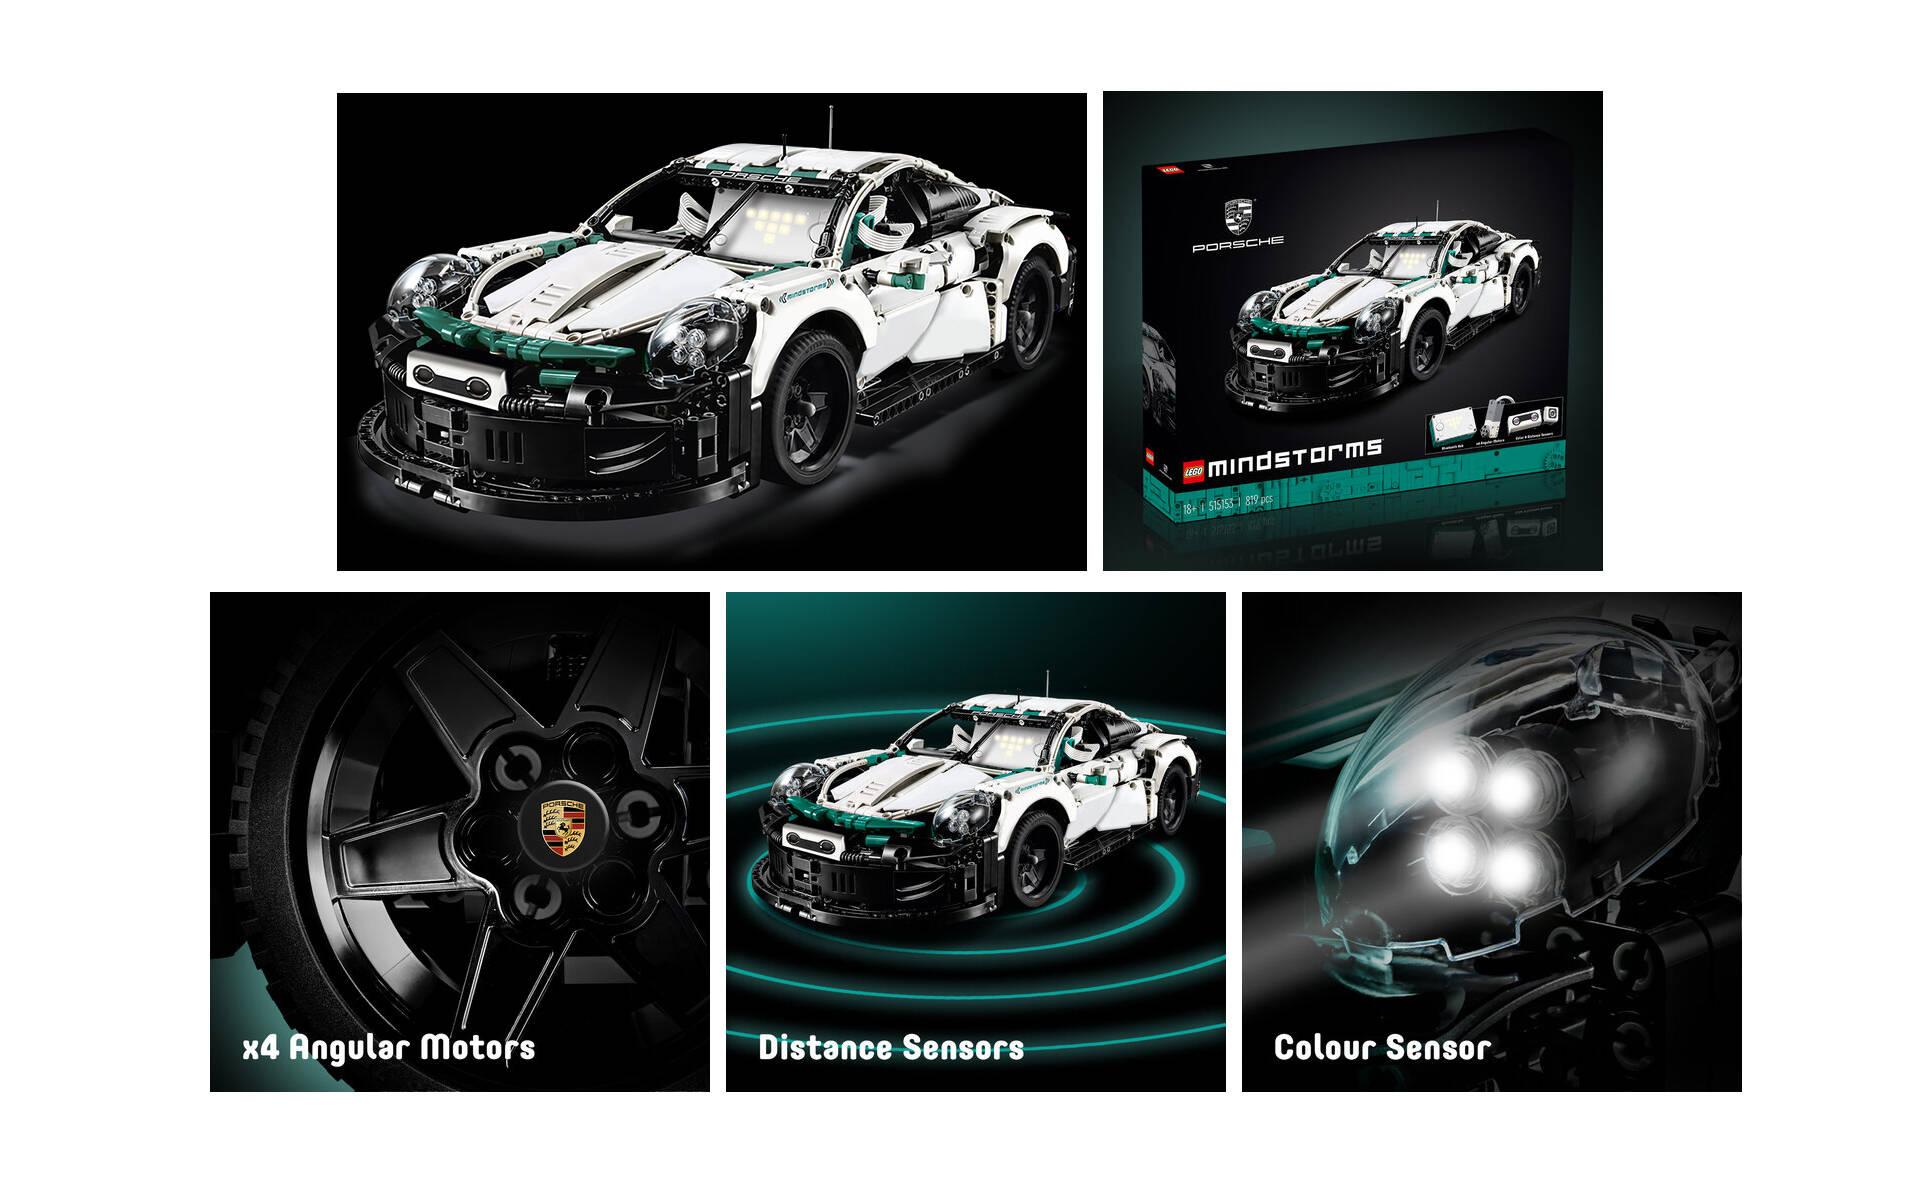 LEGO MINDSTORMS Porsche